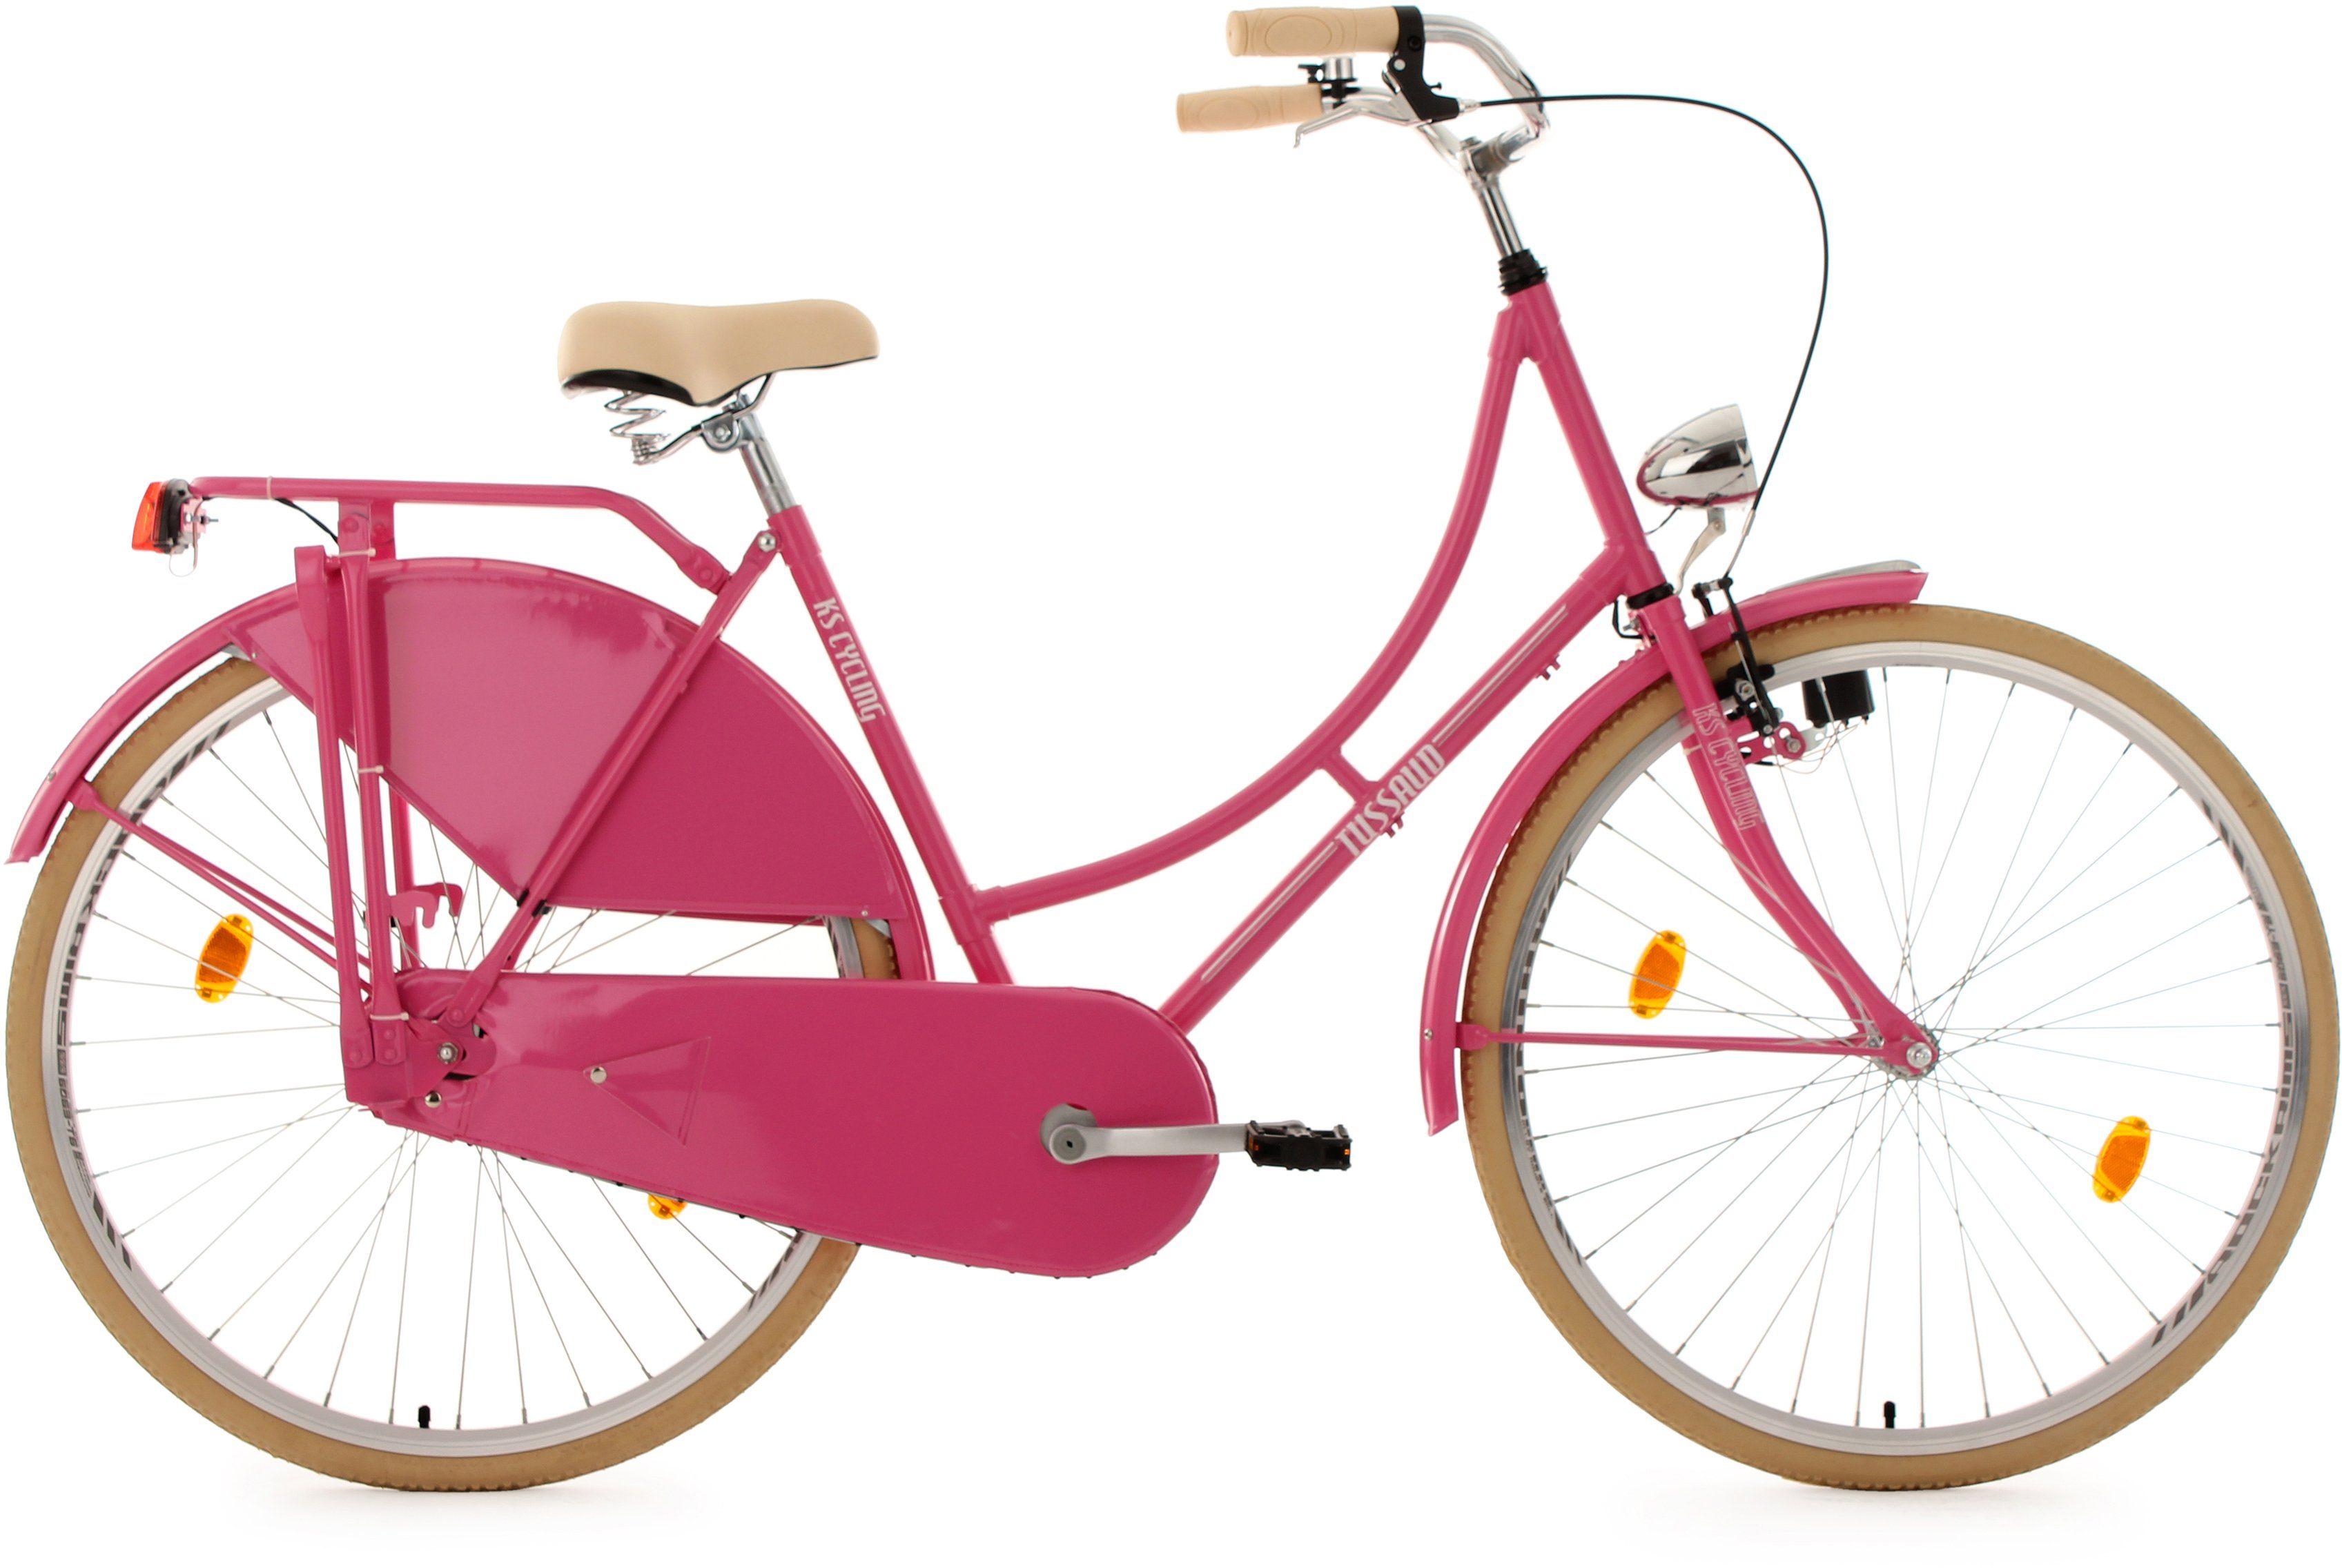 KS Cycling Hollandrad, 28 Zoll, pink, »Tussaud«